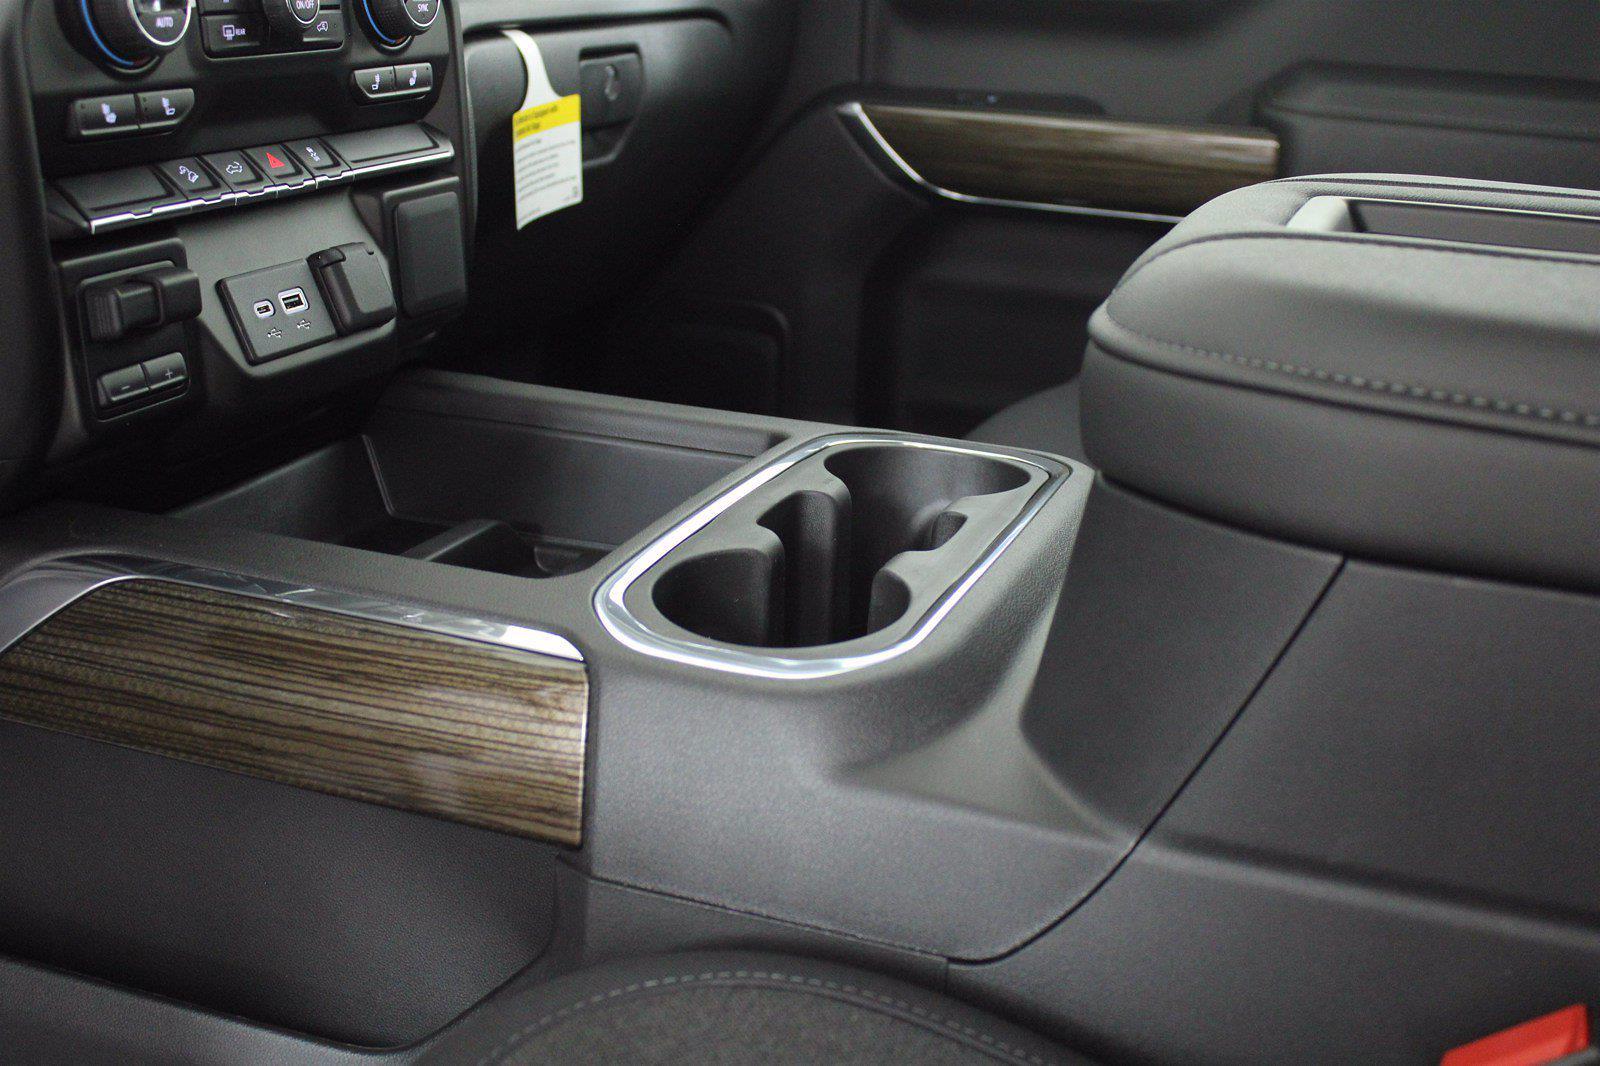 2021 Chevrolet Silverado 1500 Crew Cab 4x4, Pickup #D111110 - photo 13